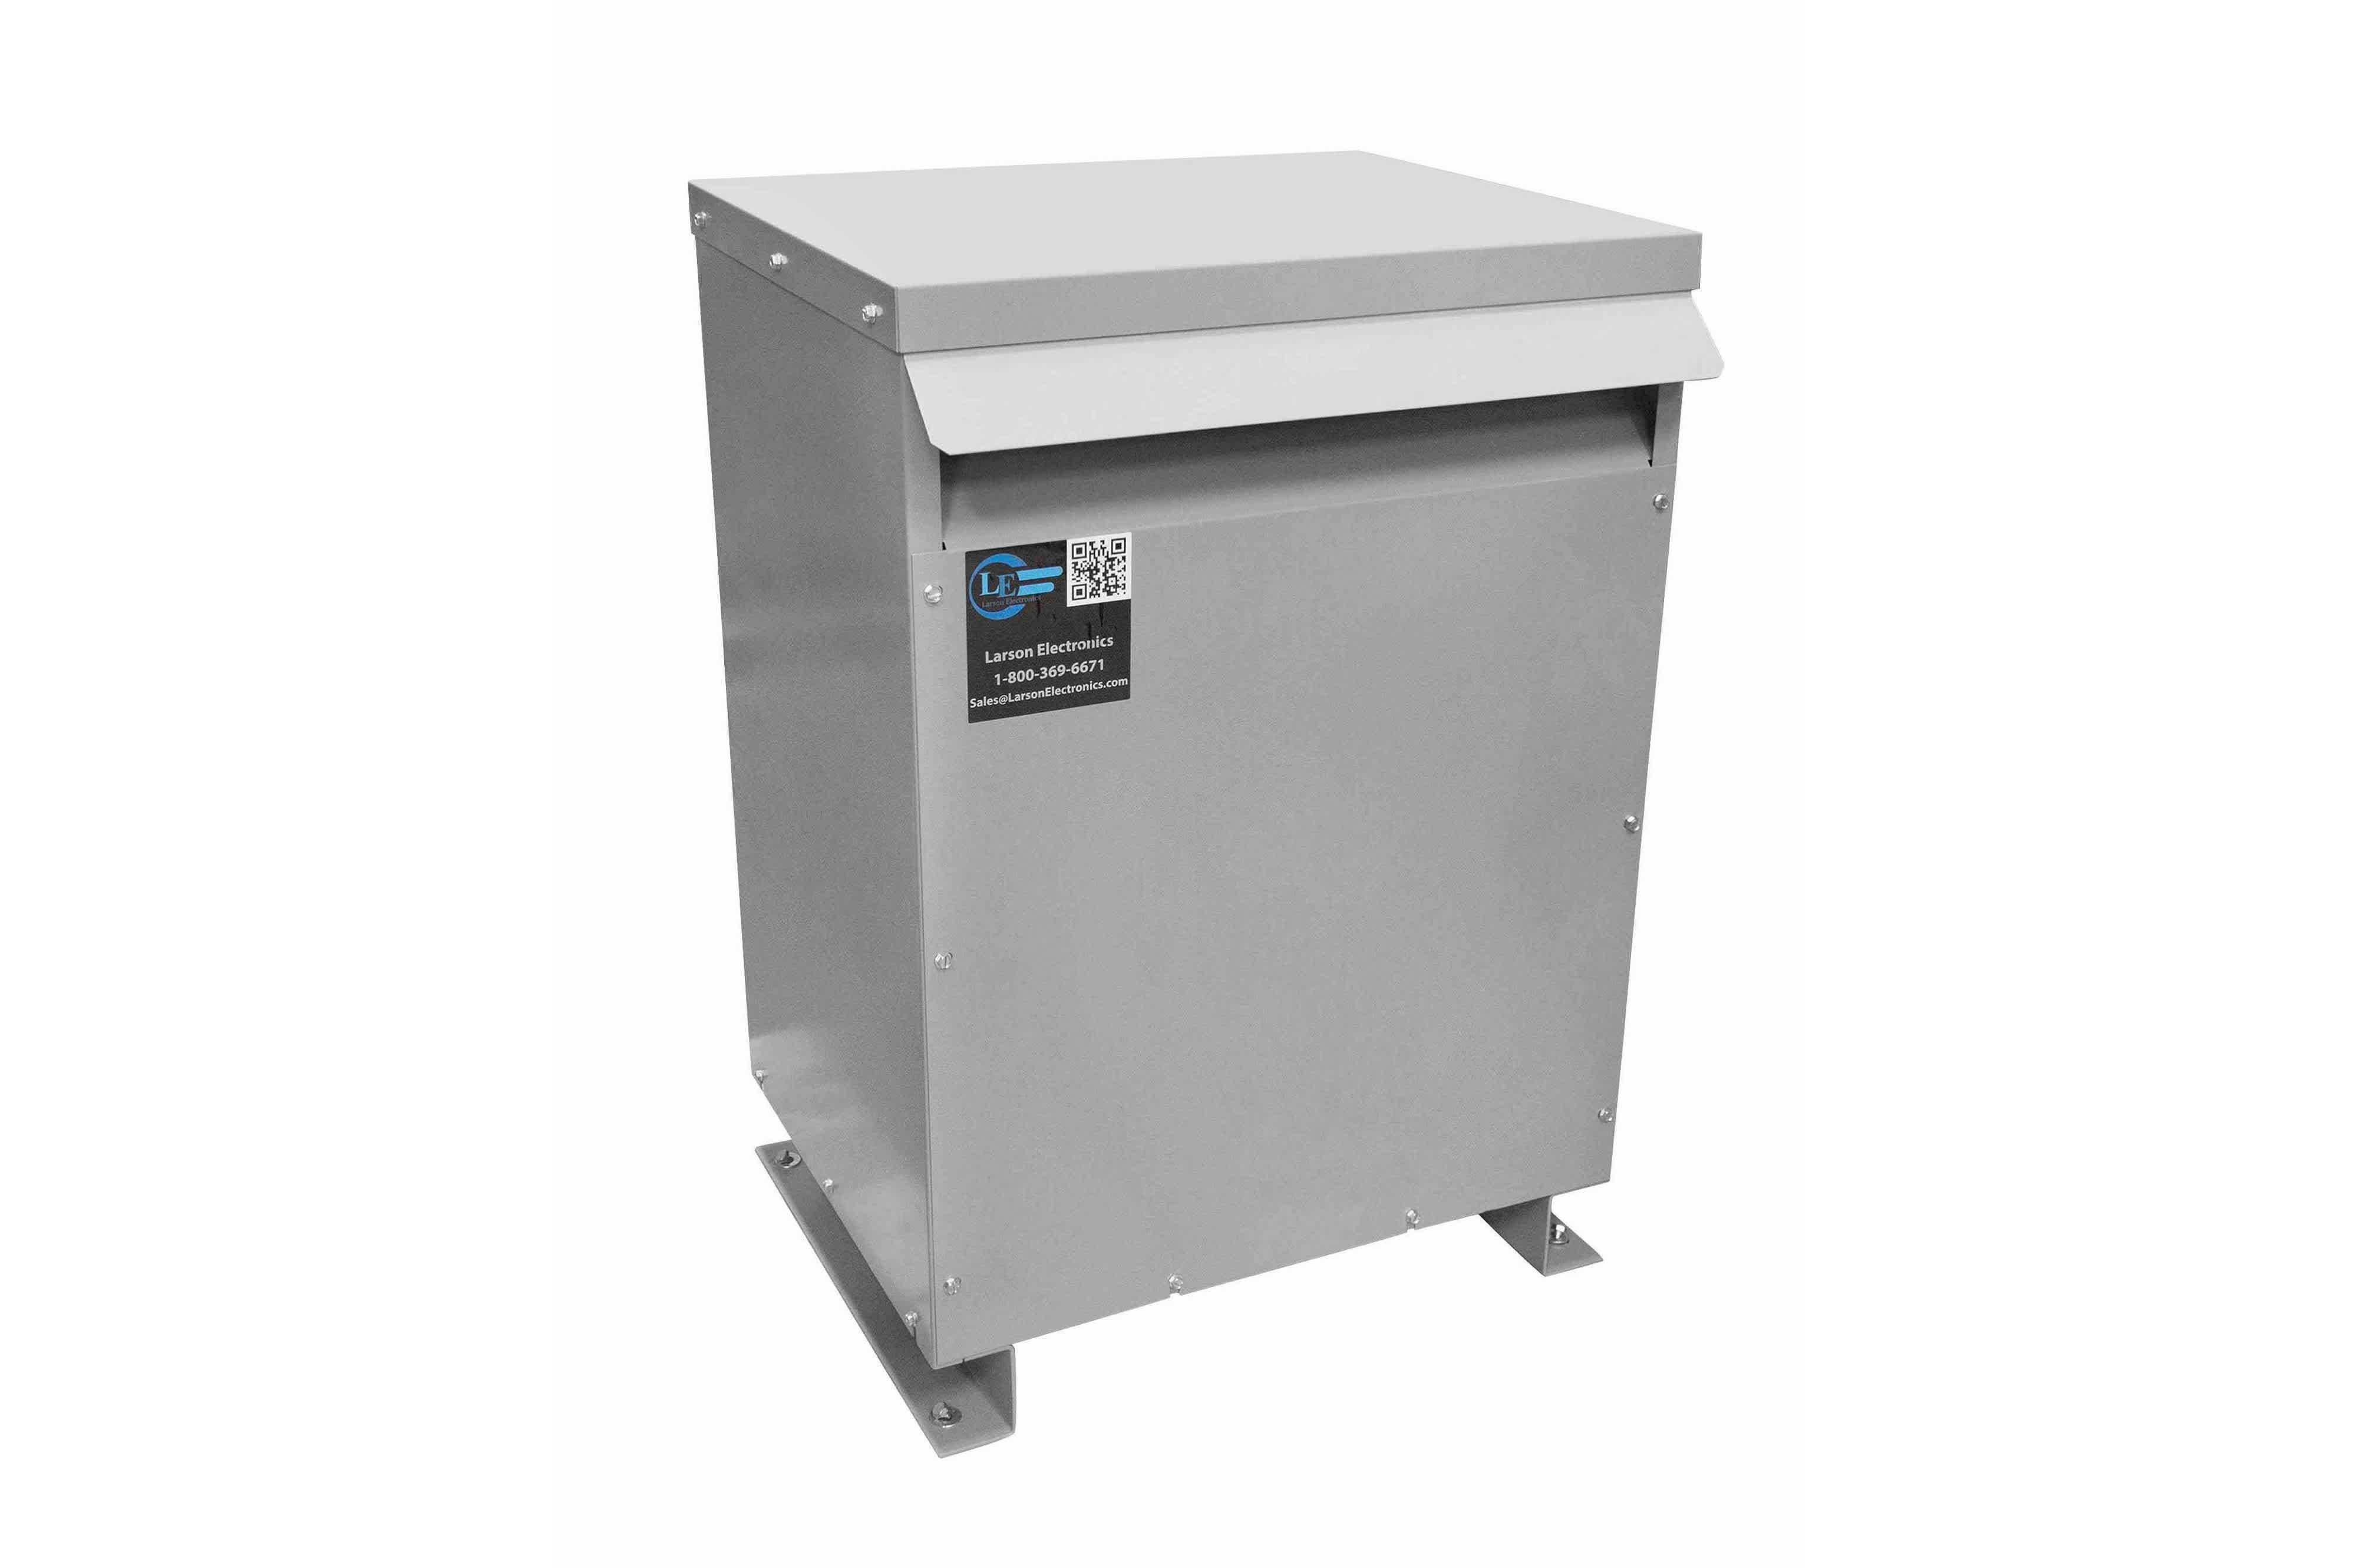 65 kVA 3PH Isolation Transformer, 480V Wye Primary, 415Y/240 Wye-N Secondary, N3R, Ventilated, 60 Hz